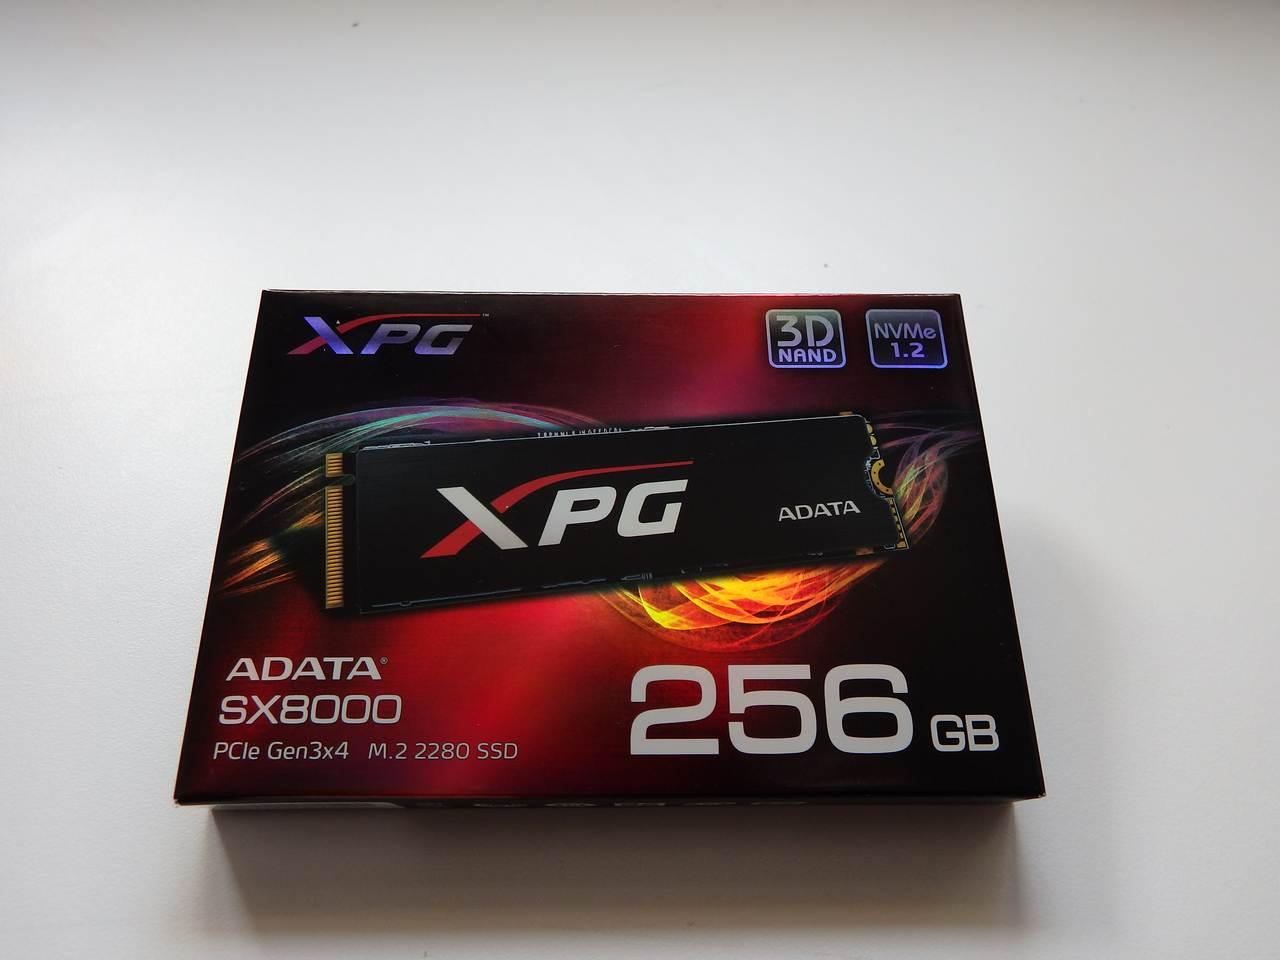 ADATA-XPG-PAX-Delivery-003